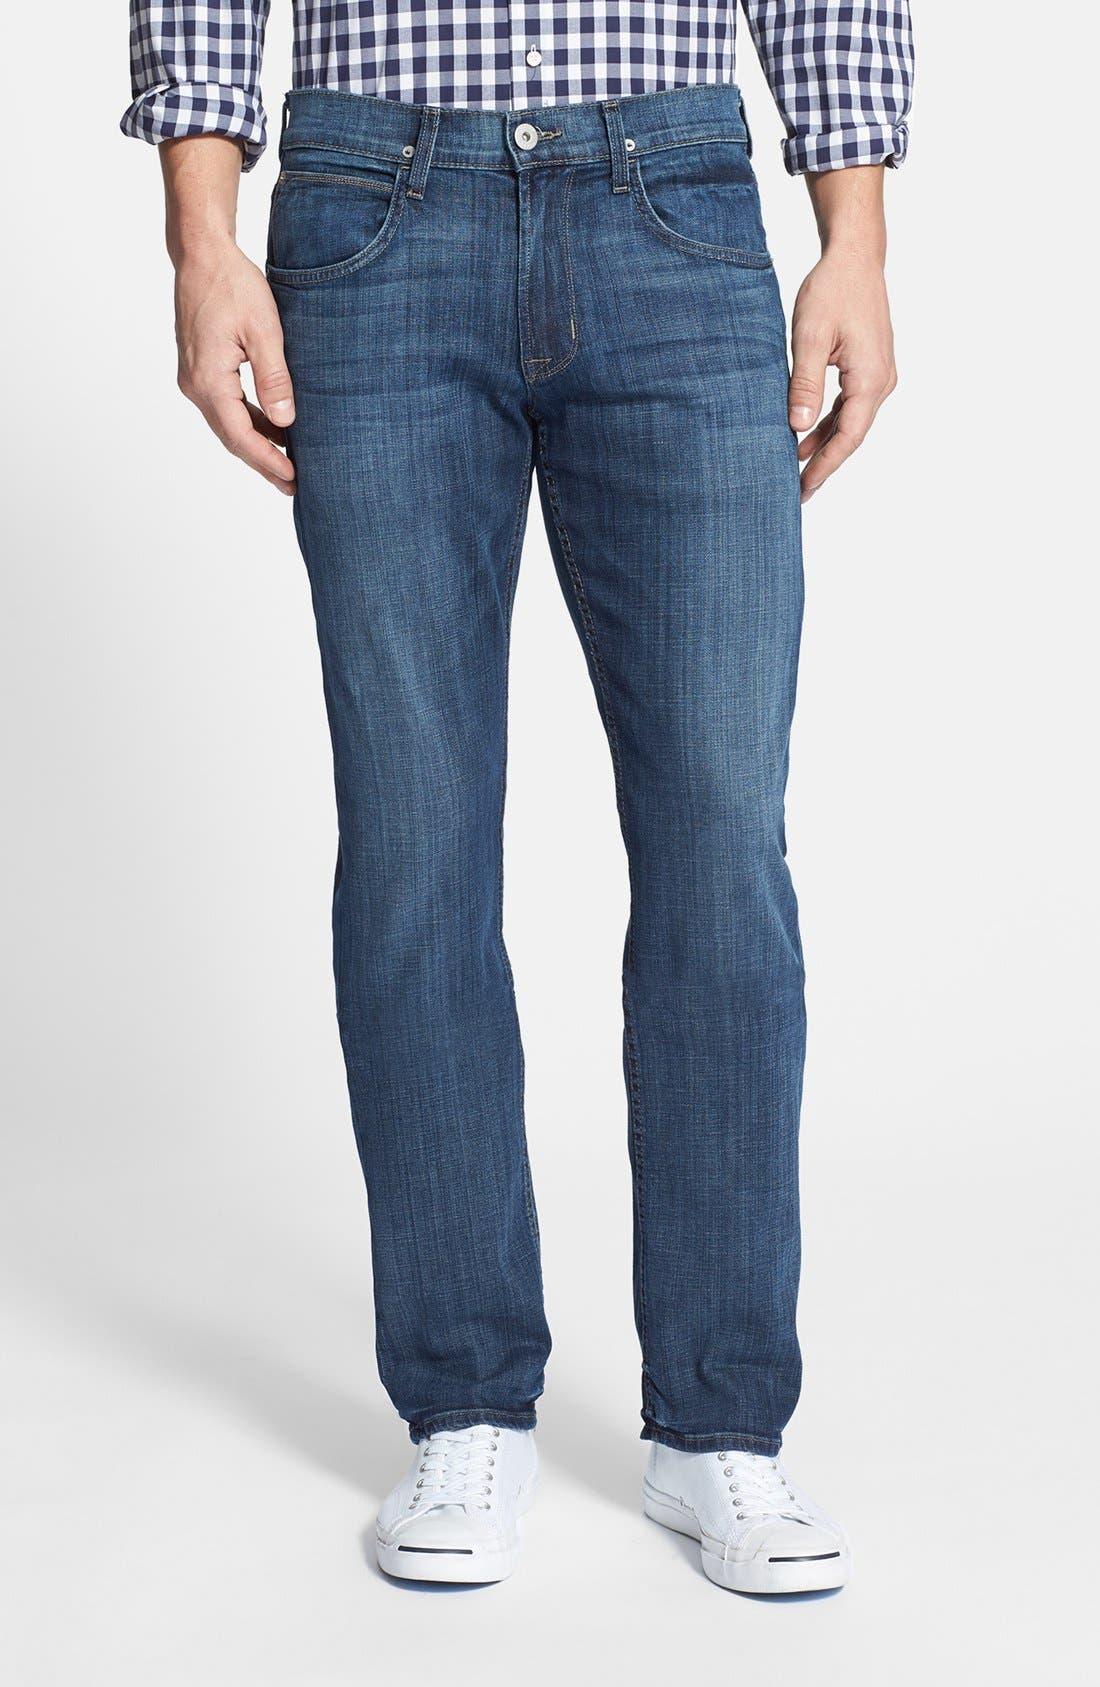 Alternate Image 1 Selected - Hudson Jeans 'Byron' Slim Straight Leg Jeans (Harris)